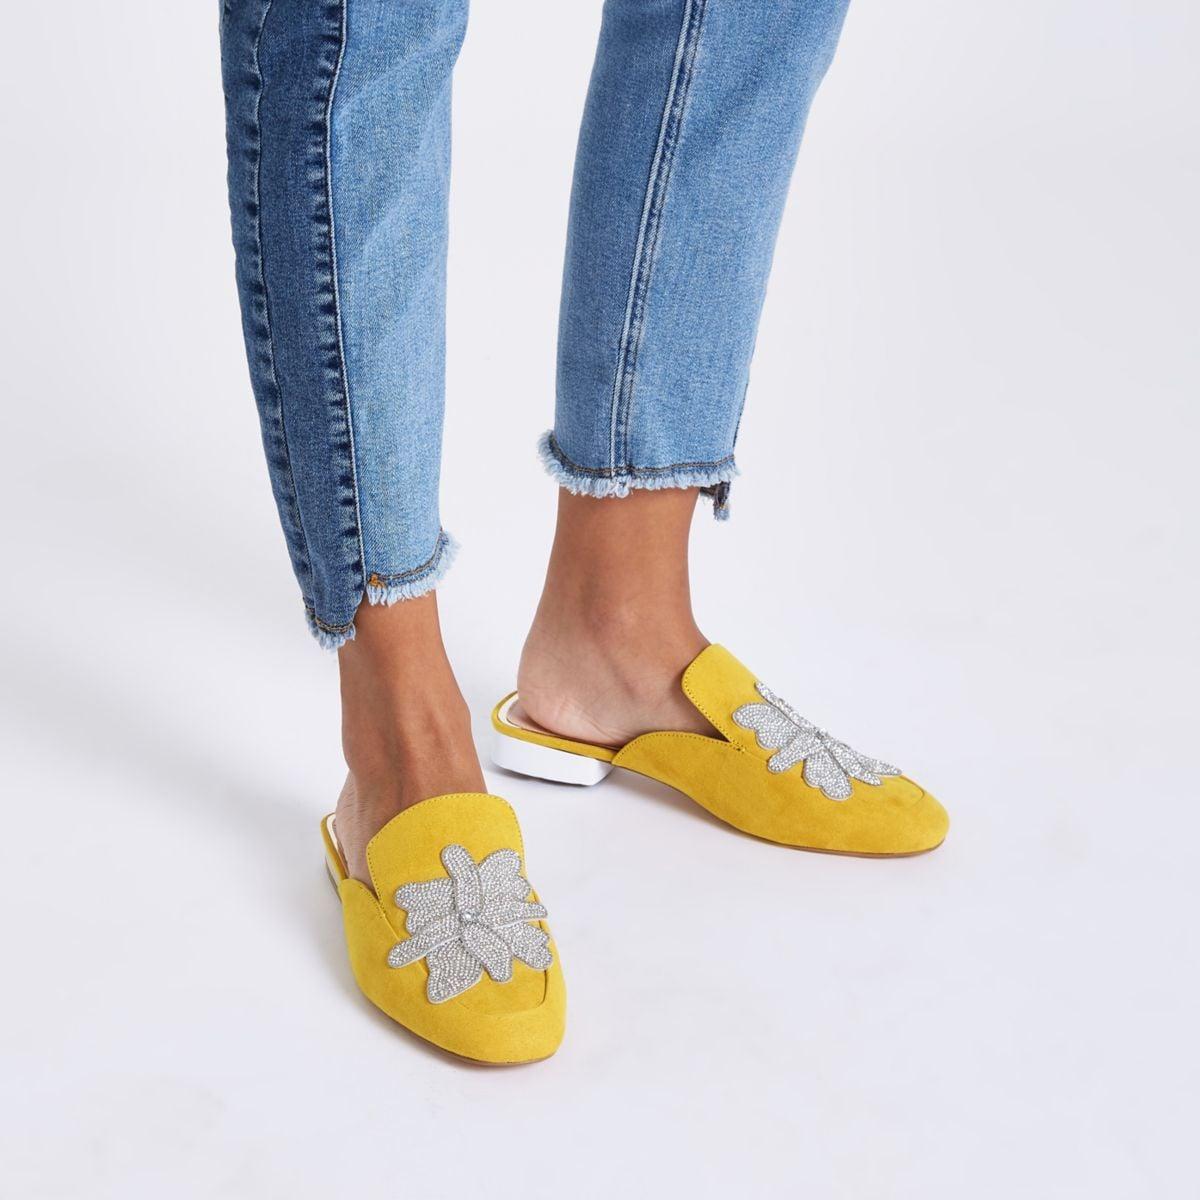 Best Flats For Wide Feet | POPSUGAR Fashion